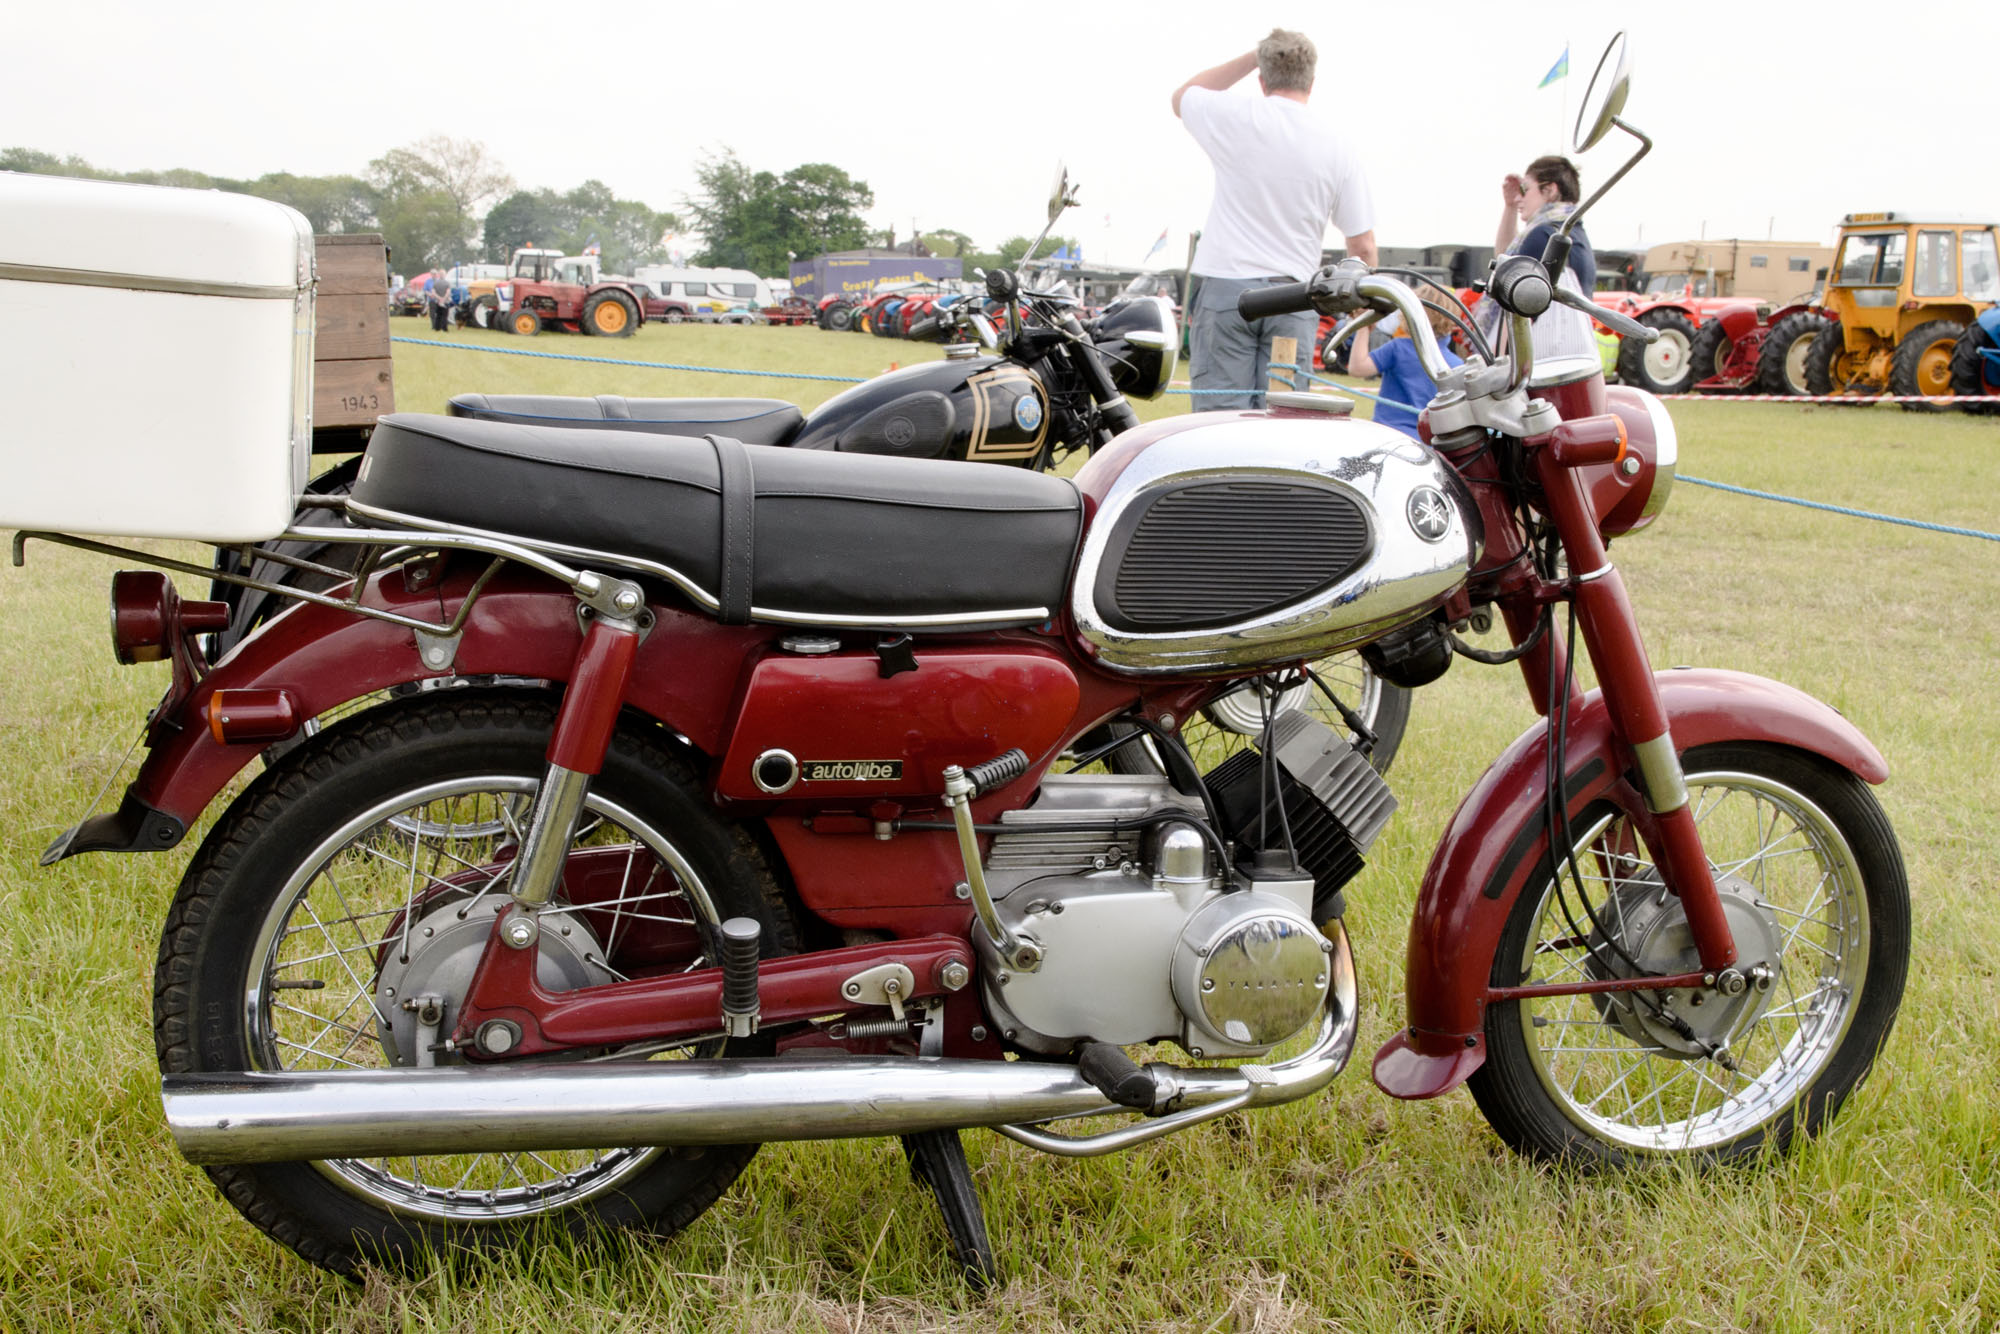 File Yamaha Ya 6 125cc 1965 27408946352 Jpg Wikimedia Commons